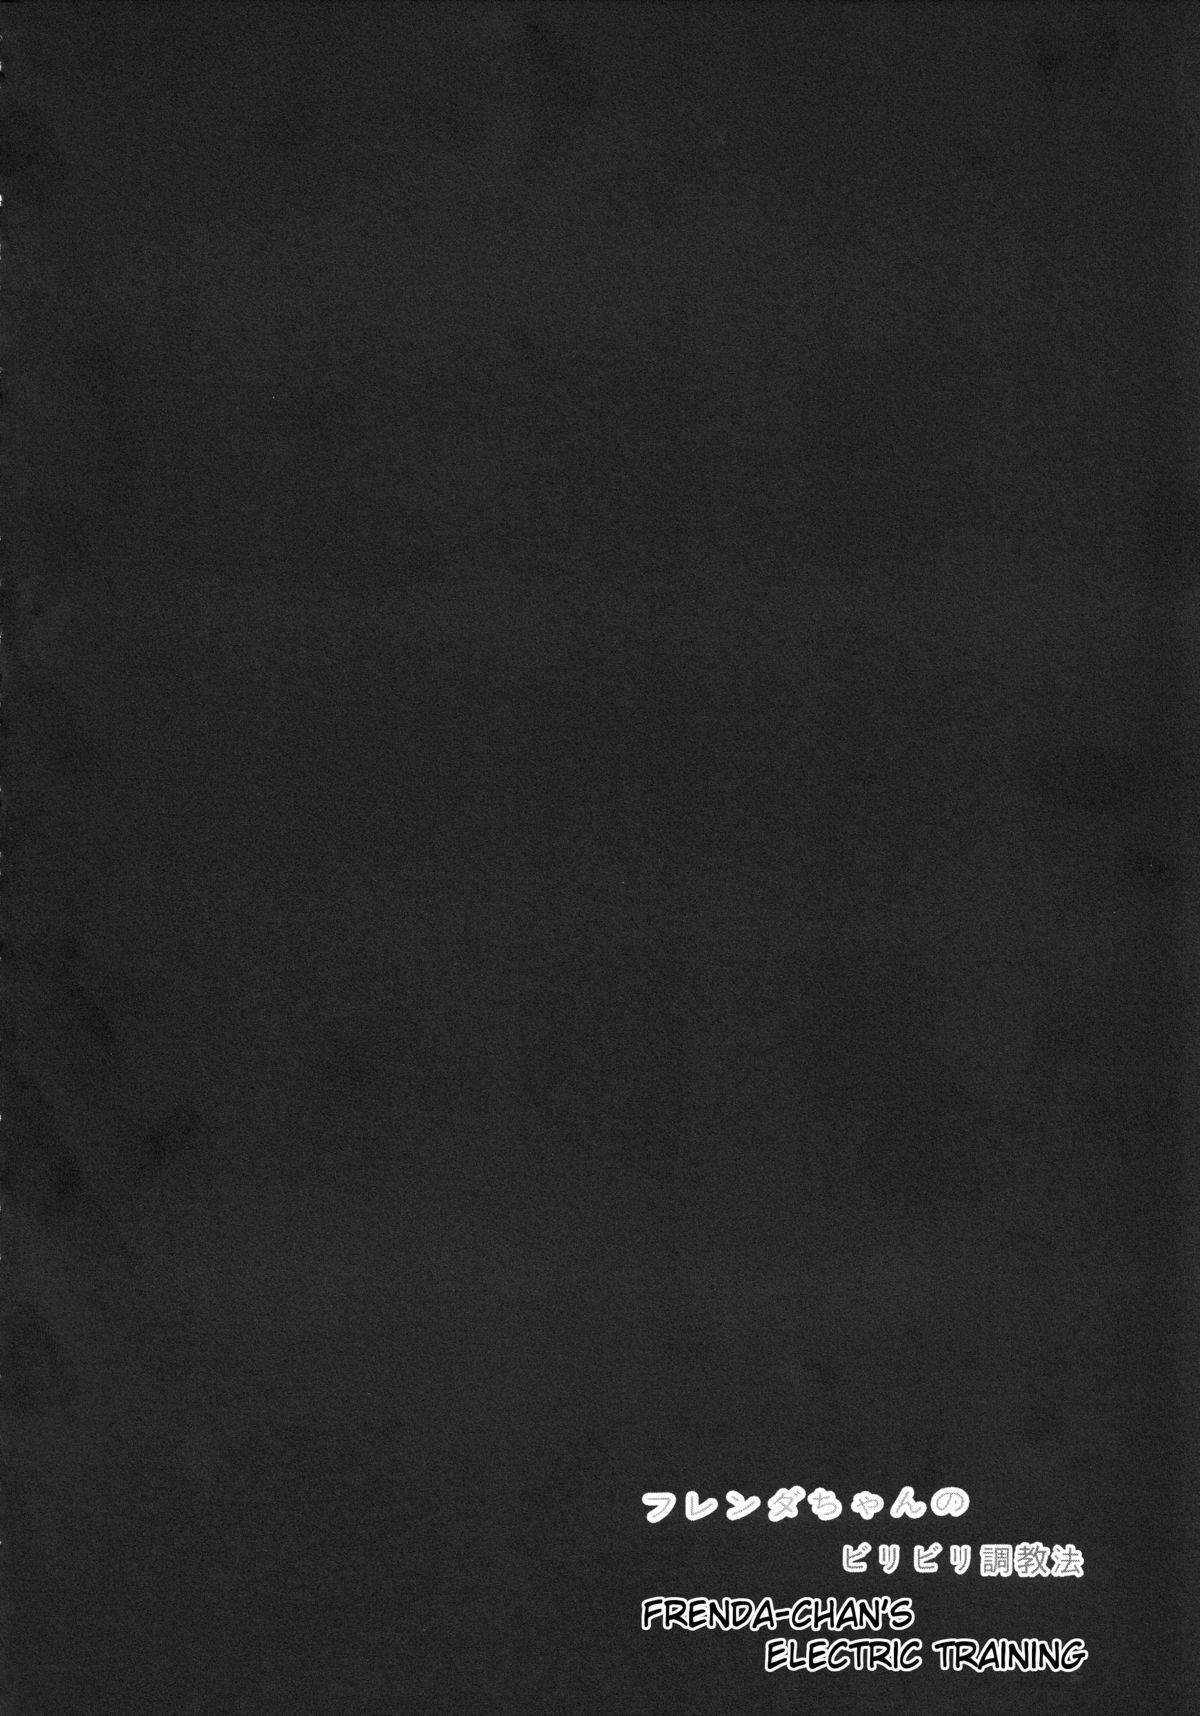 (FF22) [Magukappu (Magukappu)] Frenda-chan no Biribiri Choukyou Hou   Frenda-chan's Electric Training (Toaru Kagaku no Railgun) [English] [GreyAngel] 3